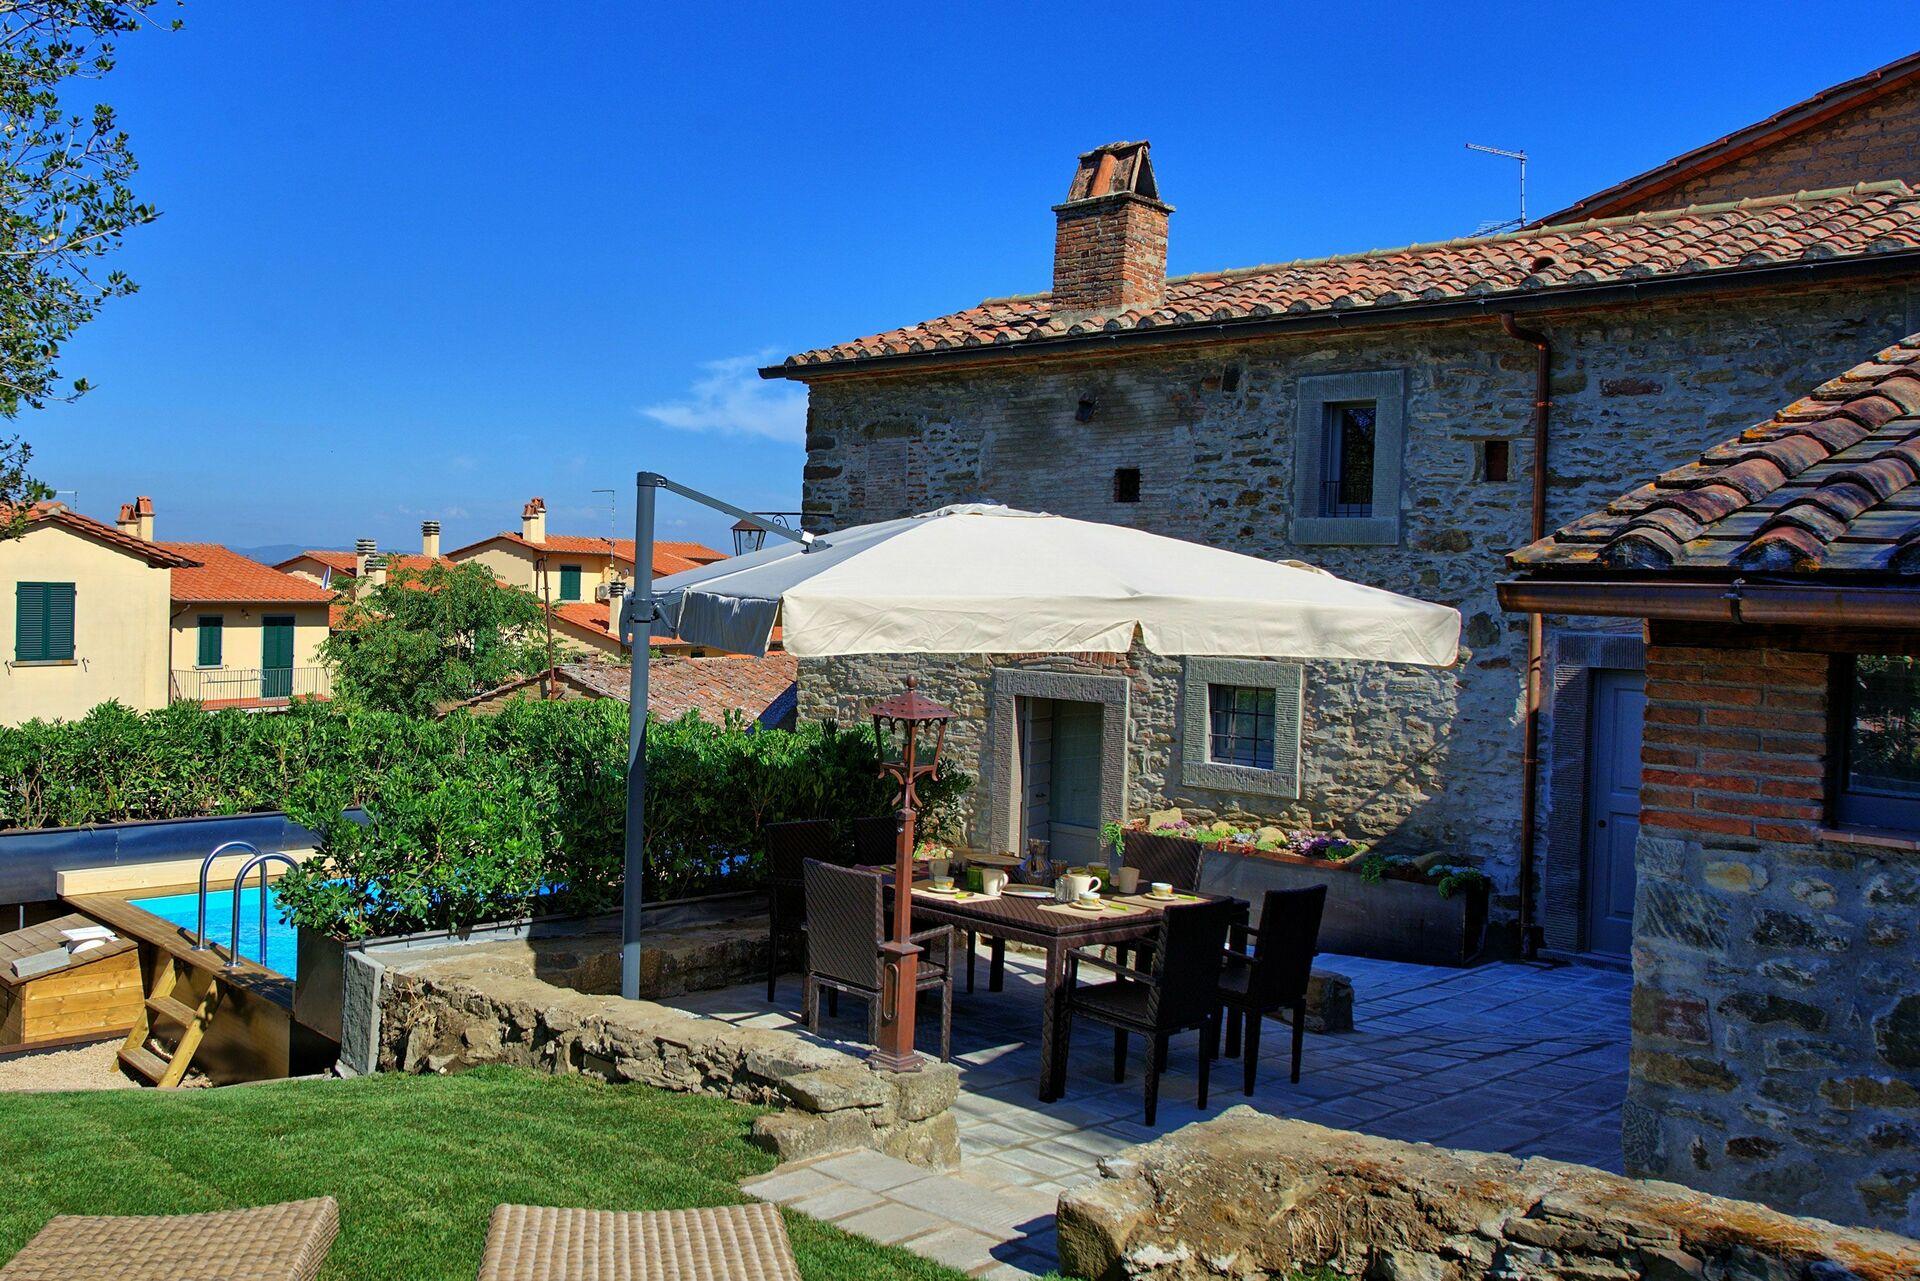 Casa La Fonte, Luxury Villa vacation rental in Cortona Tuscany - 6 ...